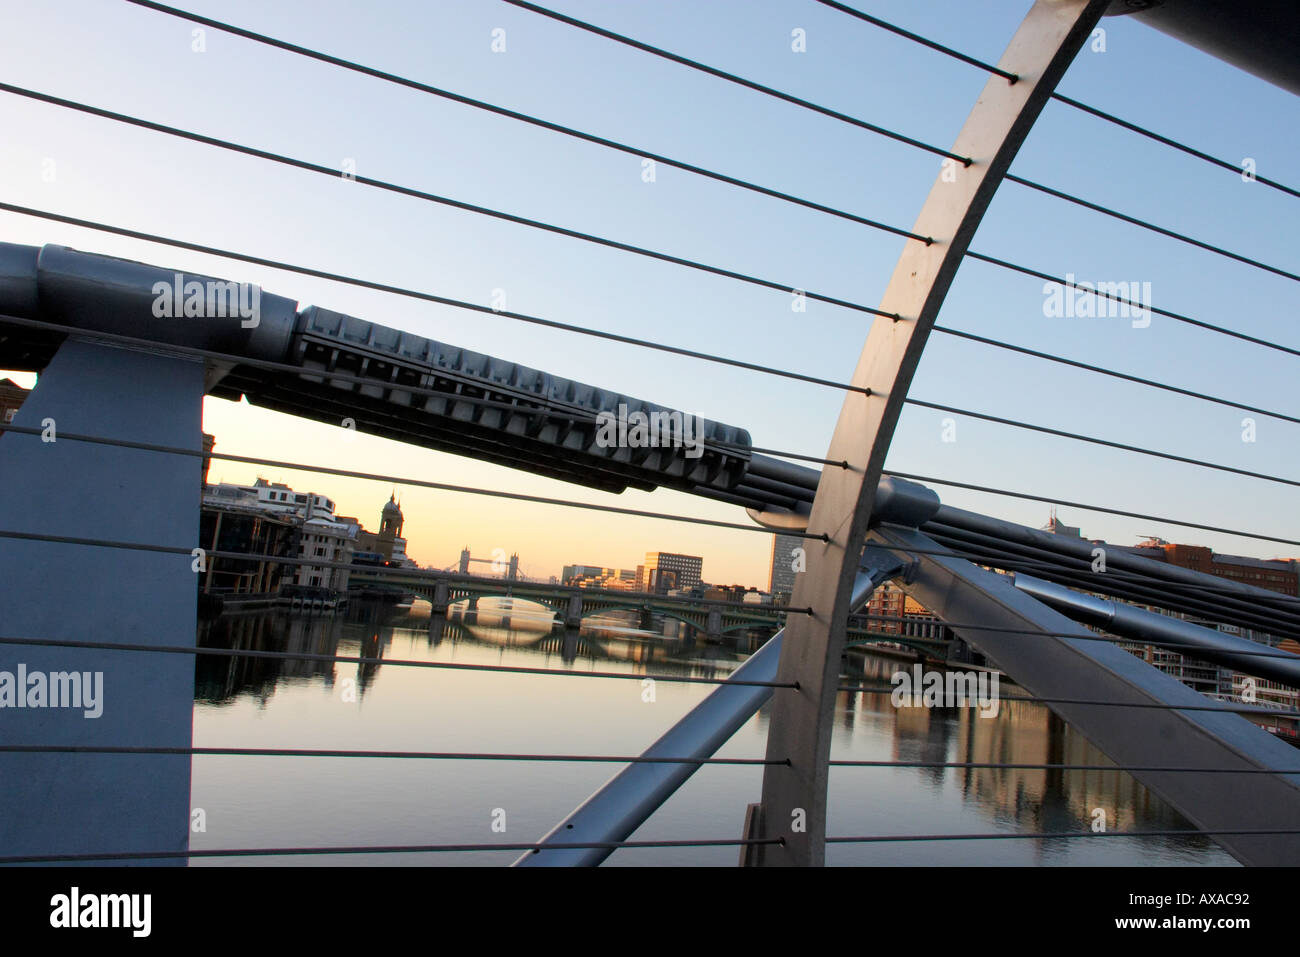 The St Pauls Millennium Bridge in London England Stock Photo